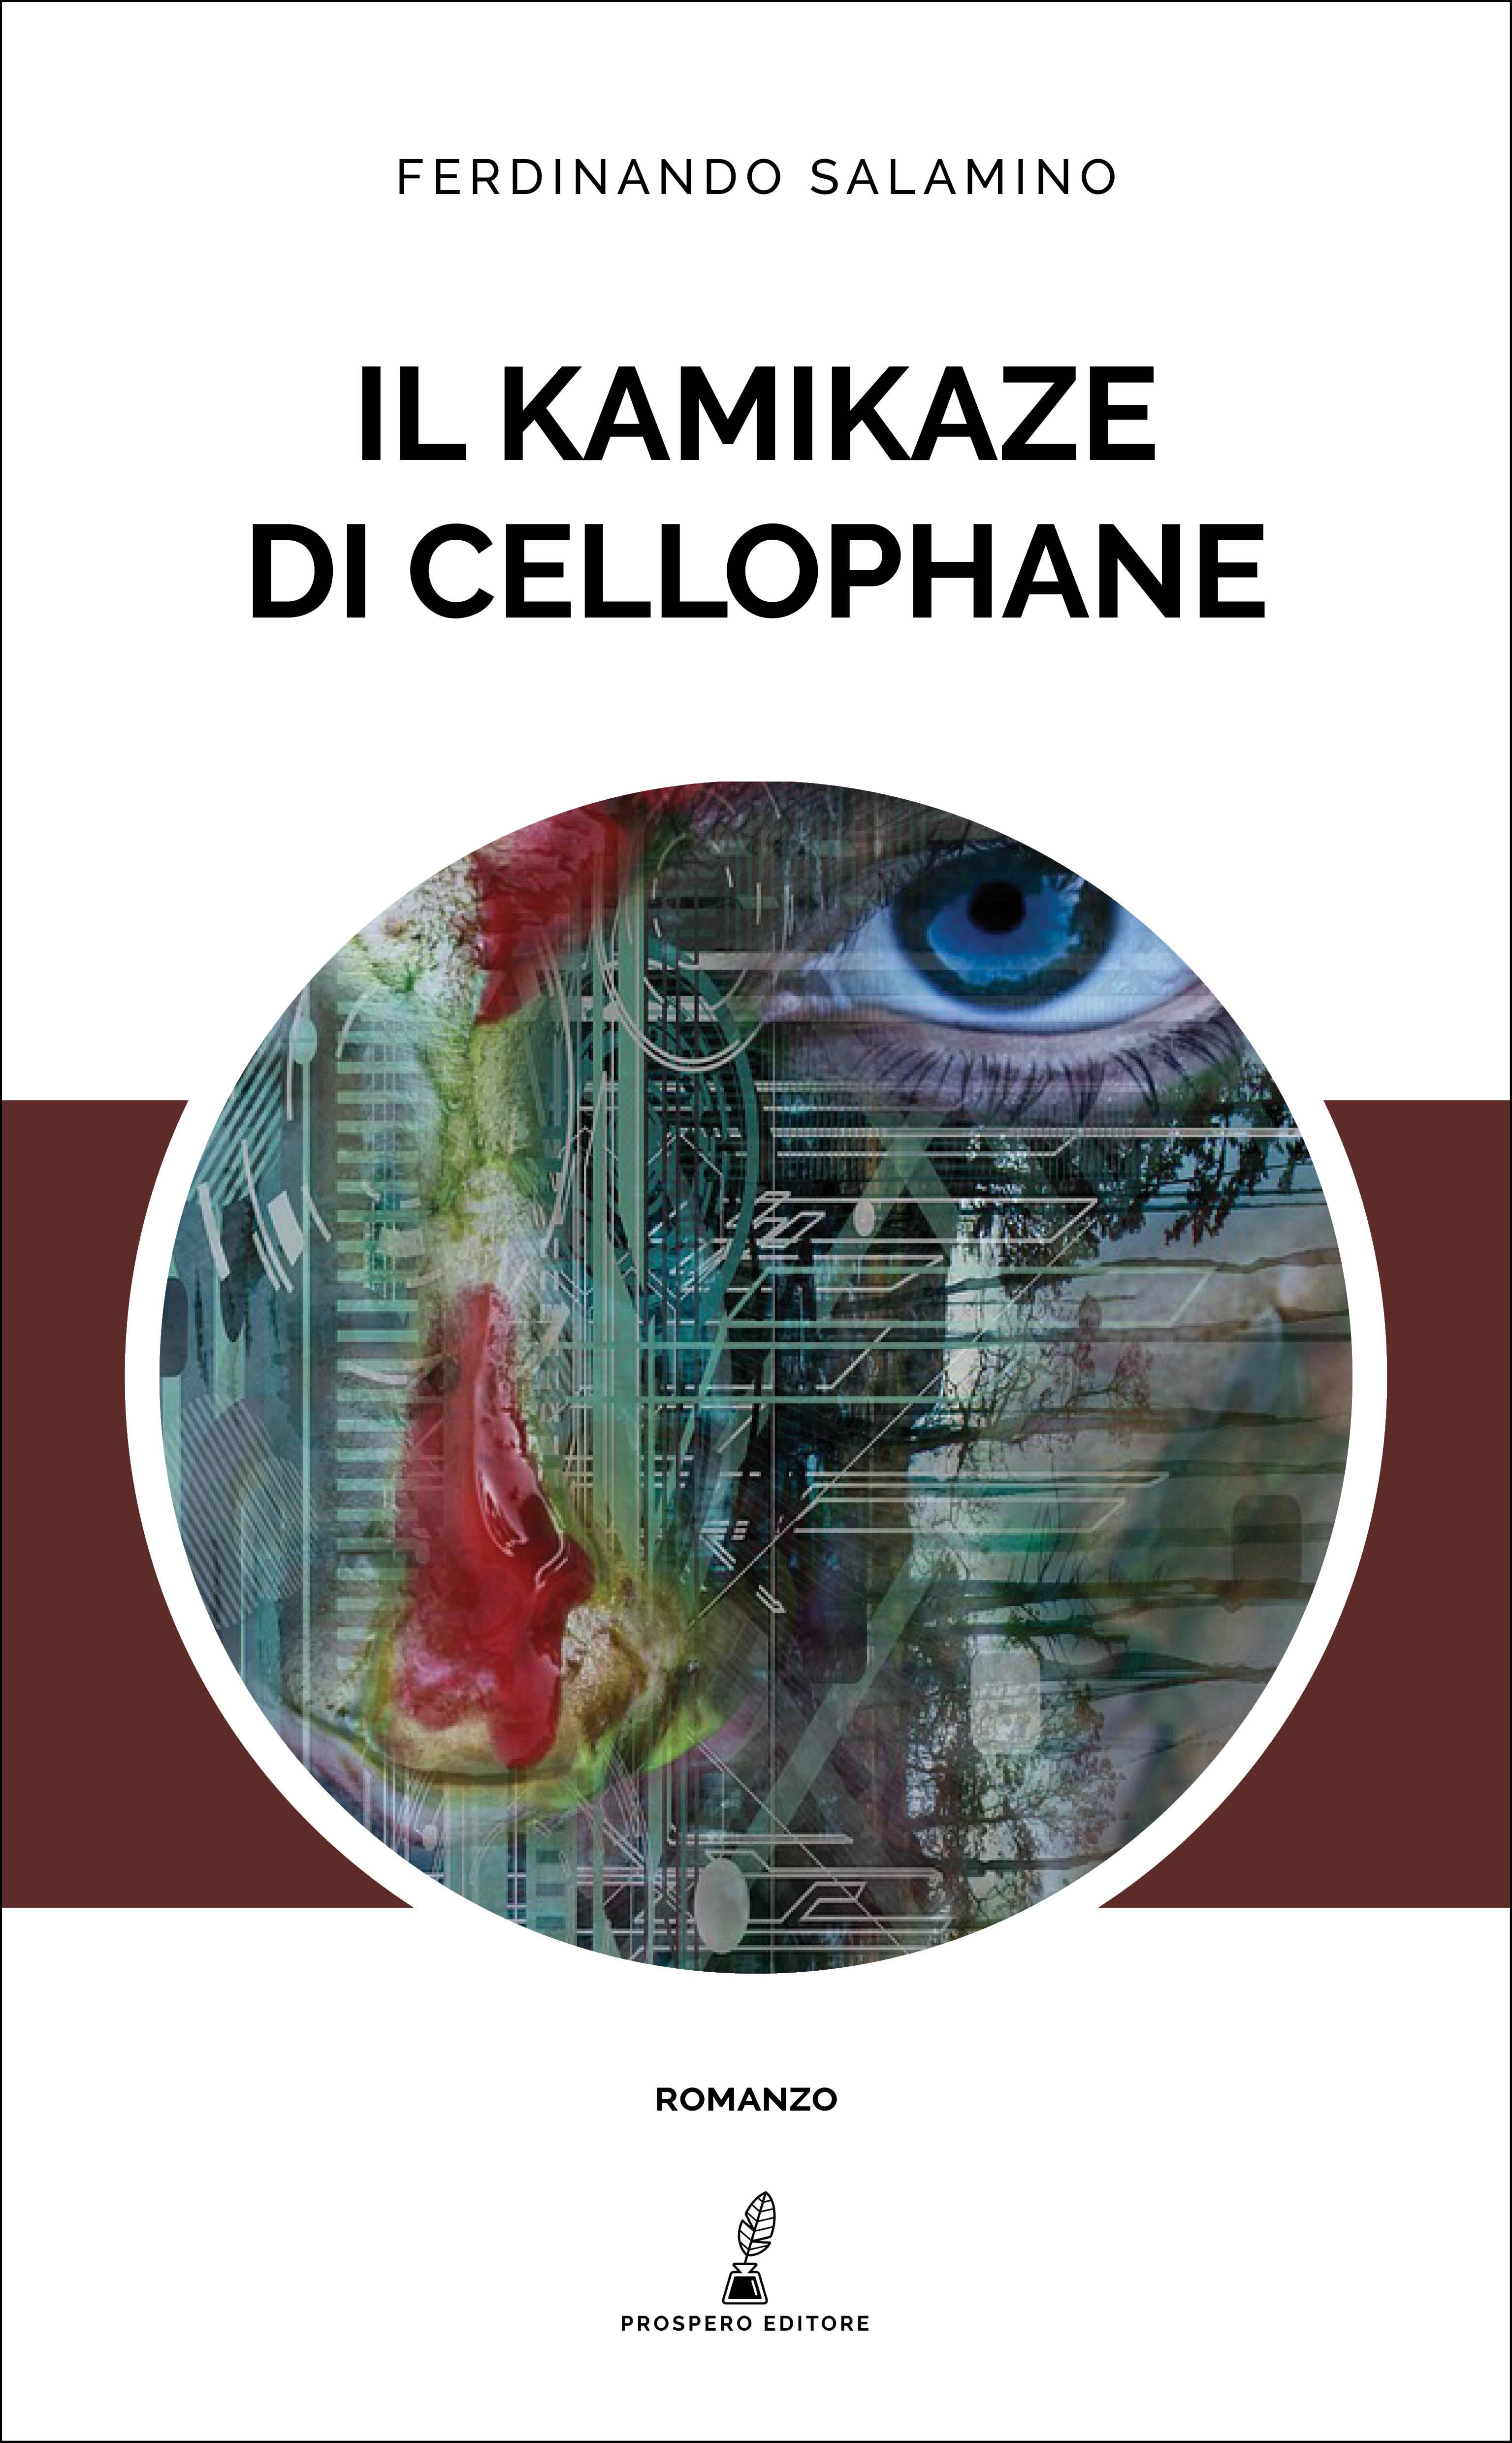 Il kamikaze di cellophane-image